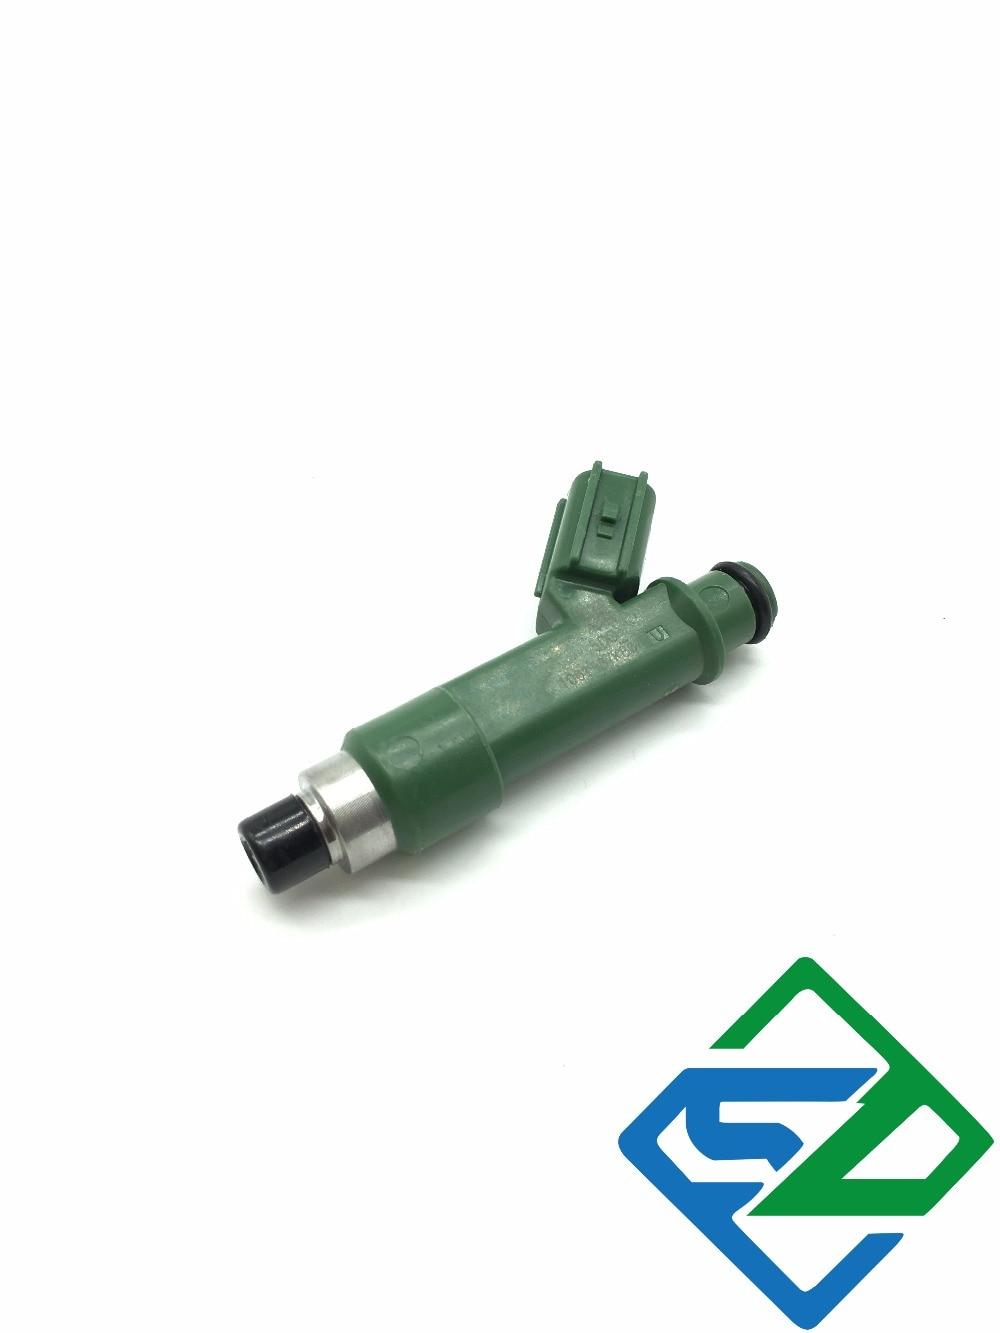 Fuel Injector Nozzle For Toyota Camry Corolla Nissan 1JZGTE 2JZGTE RB20DET  700CC OEM:1001-87K80 1001